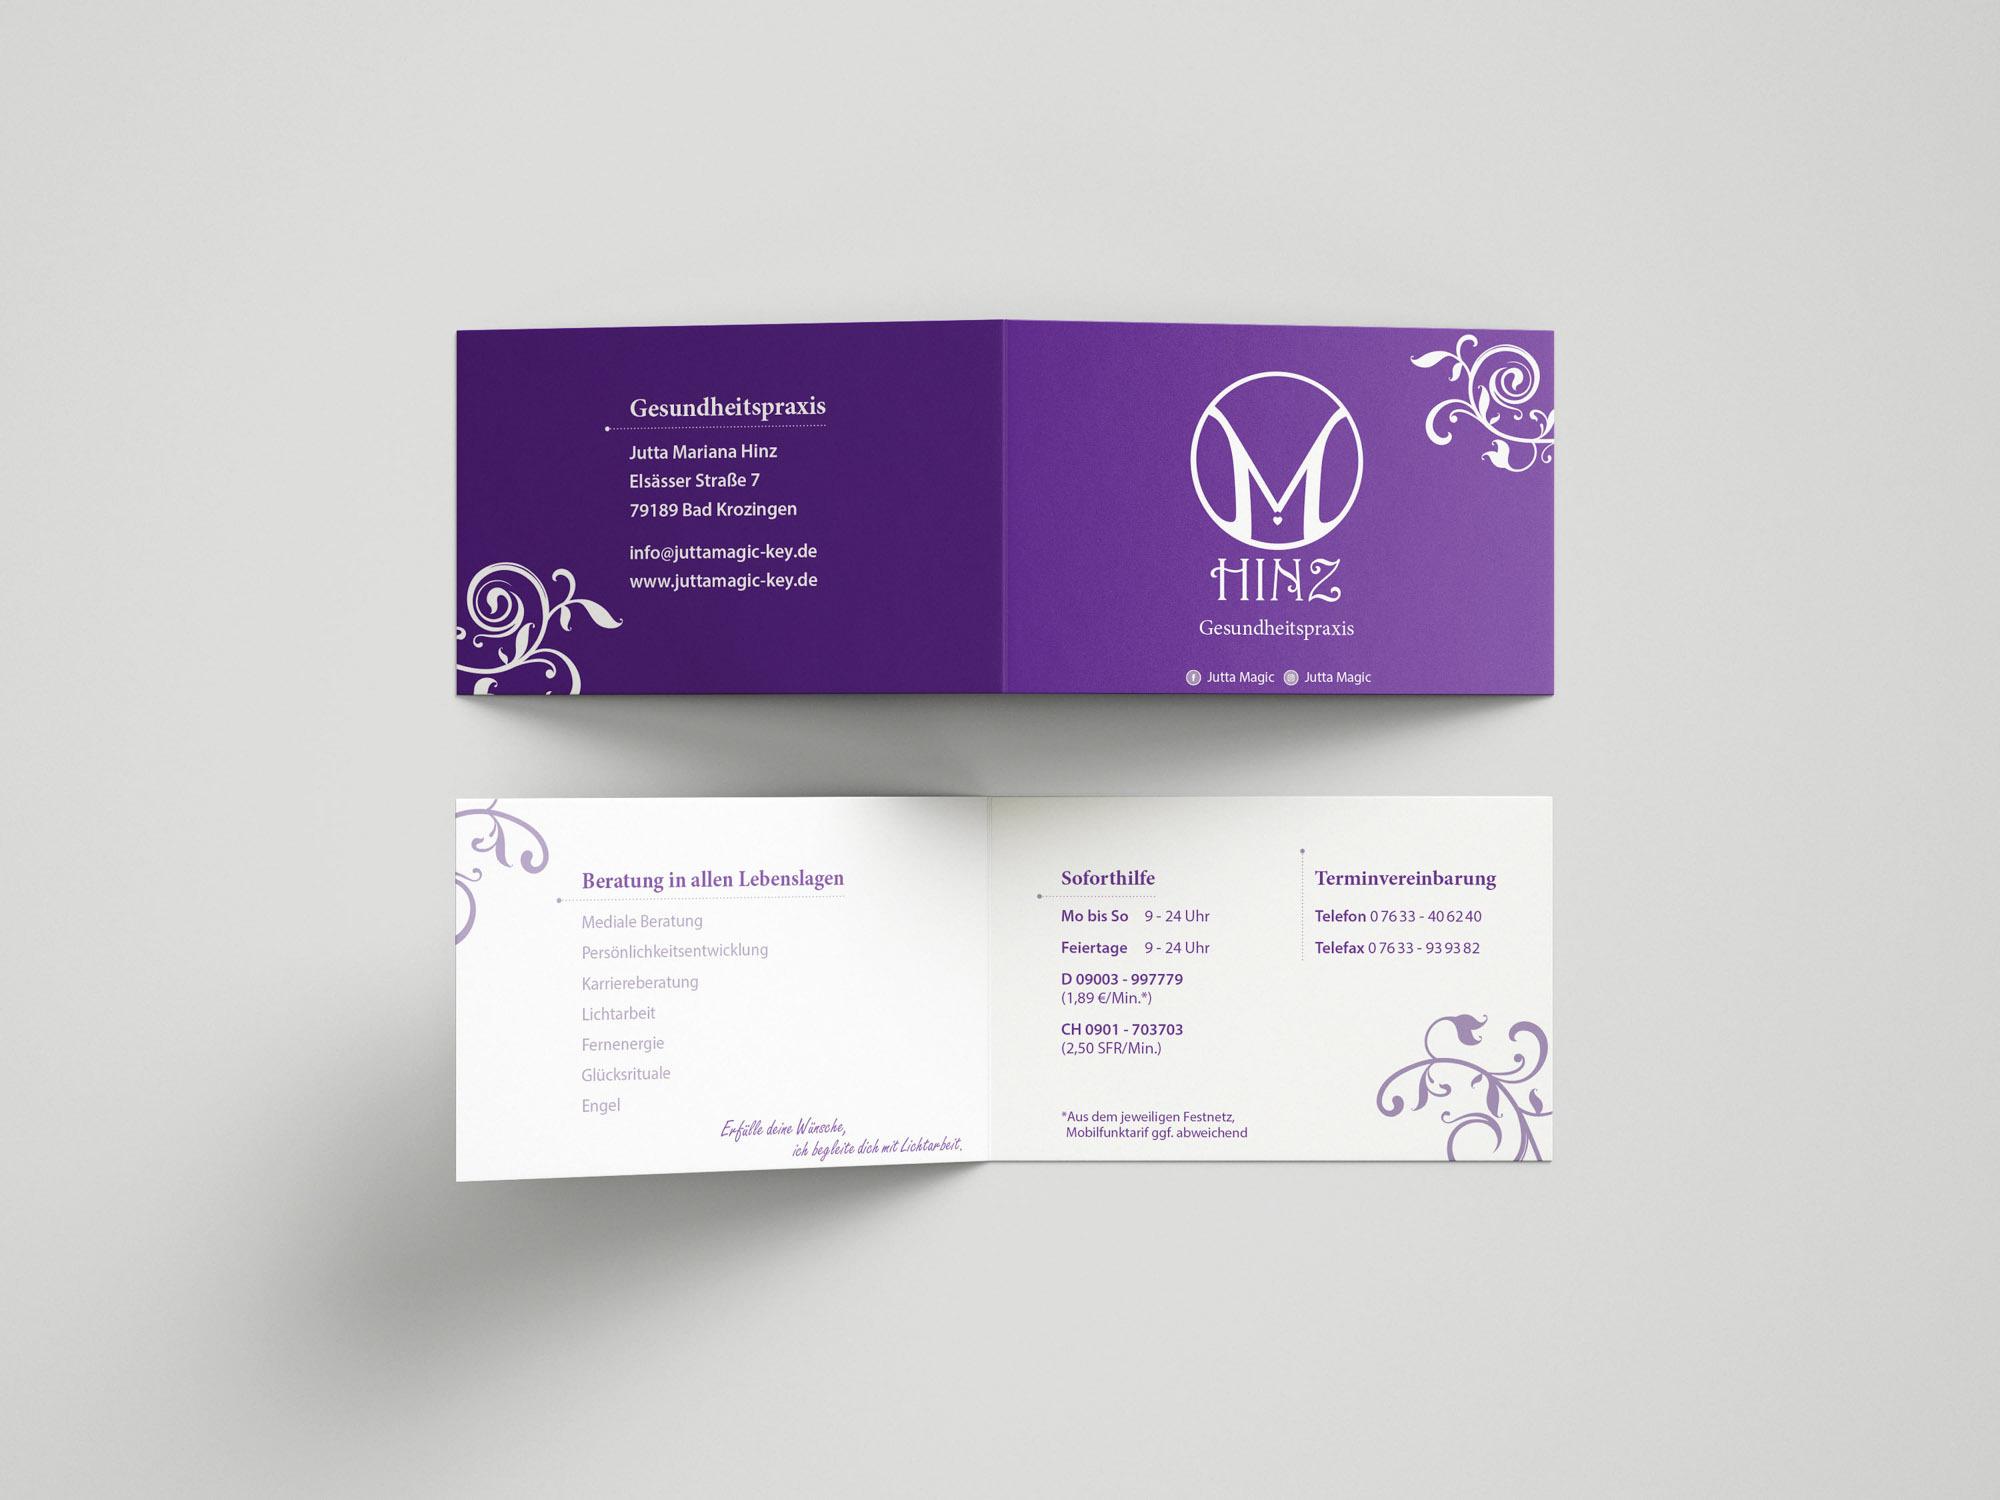 Visitenkarte 1 lila Hinz | MedienMacher